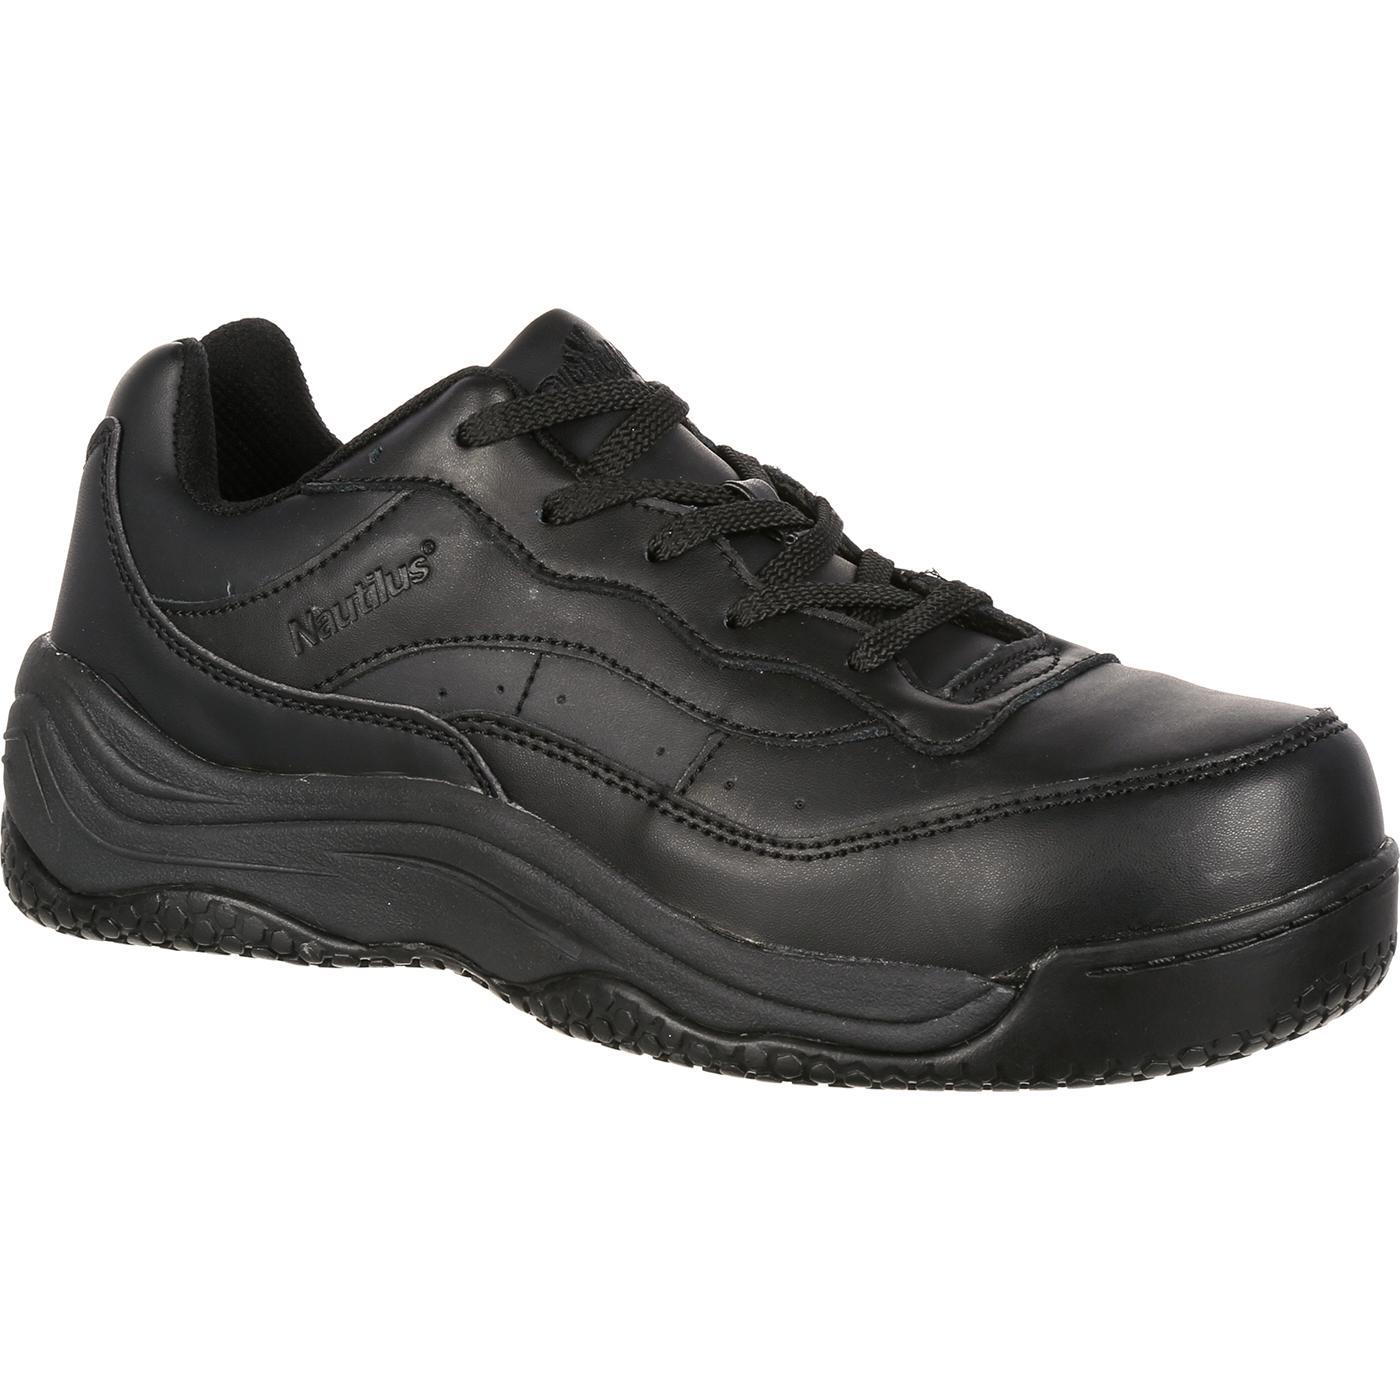 Slip Resistant Slip On Work Shoes